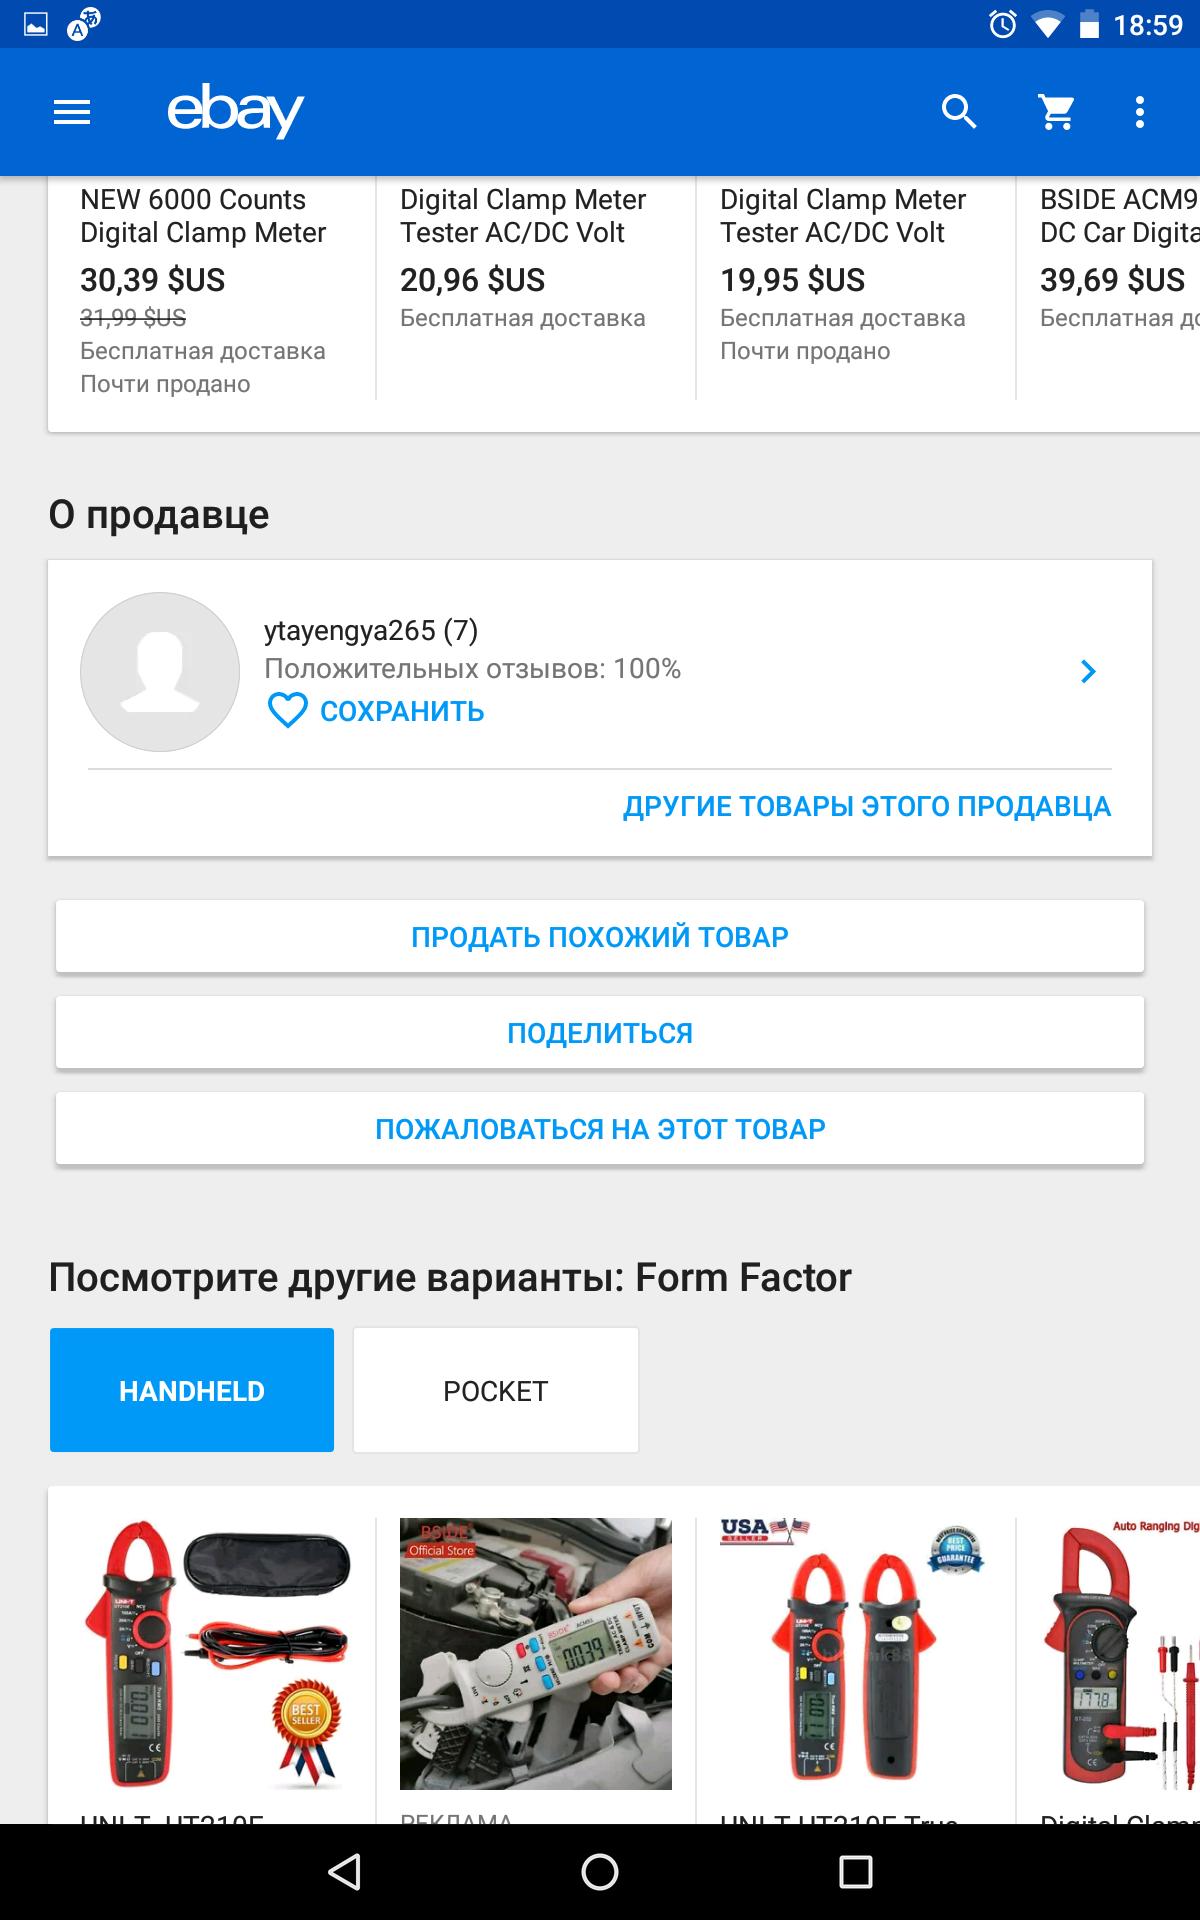 screenshot_20190507-190041-png.385185